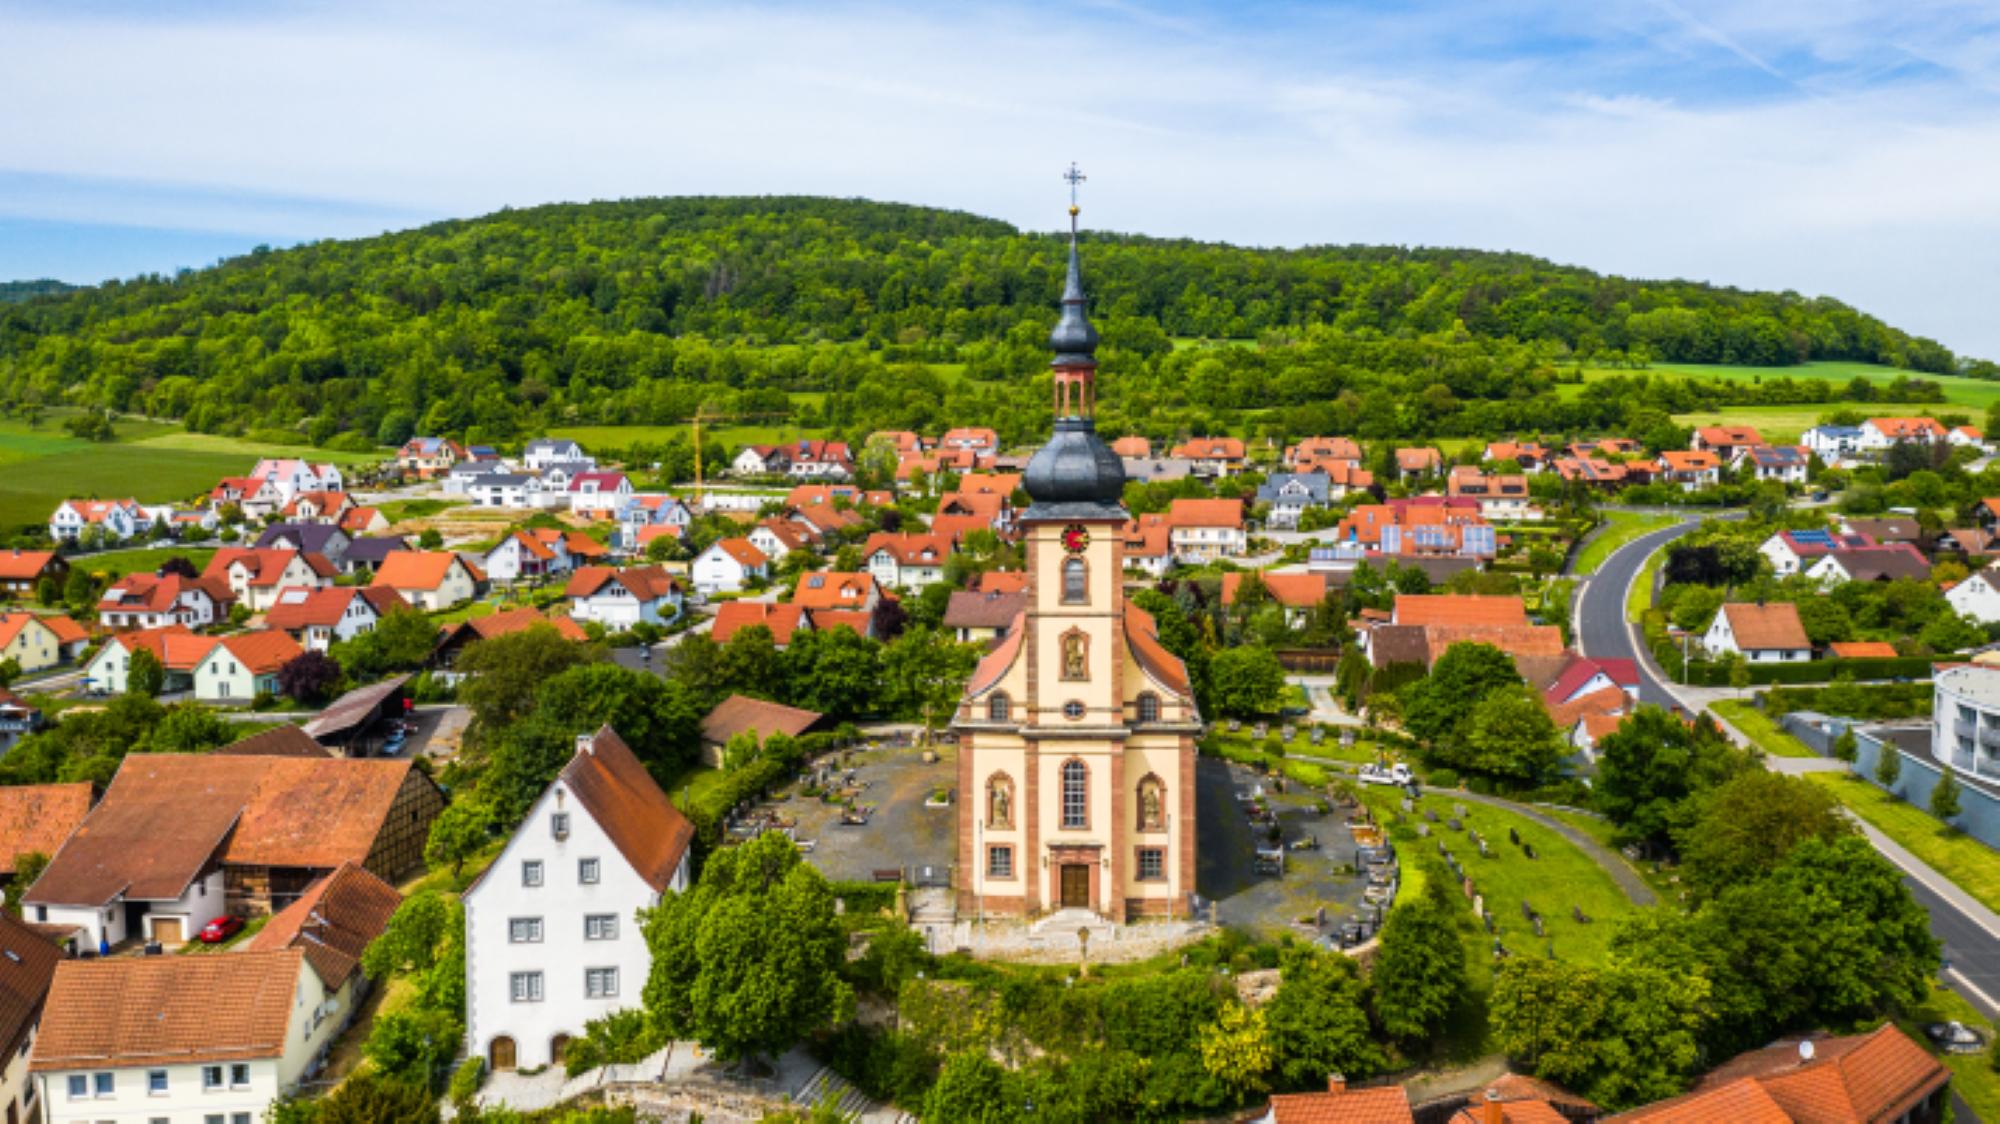 Oberelsbach